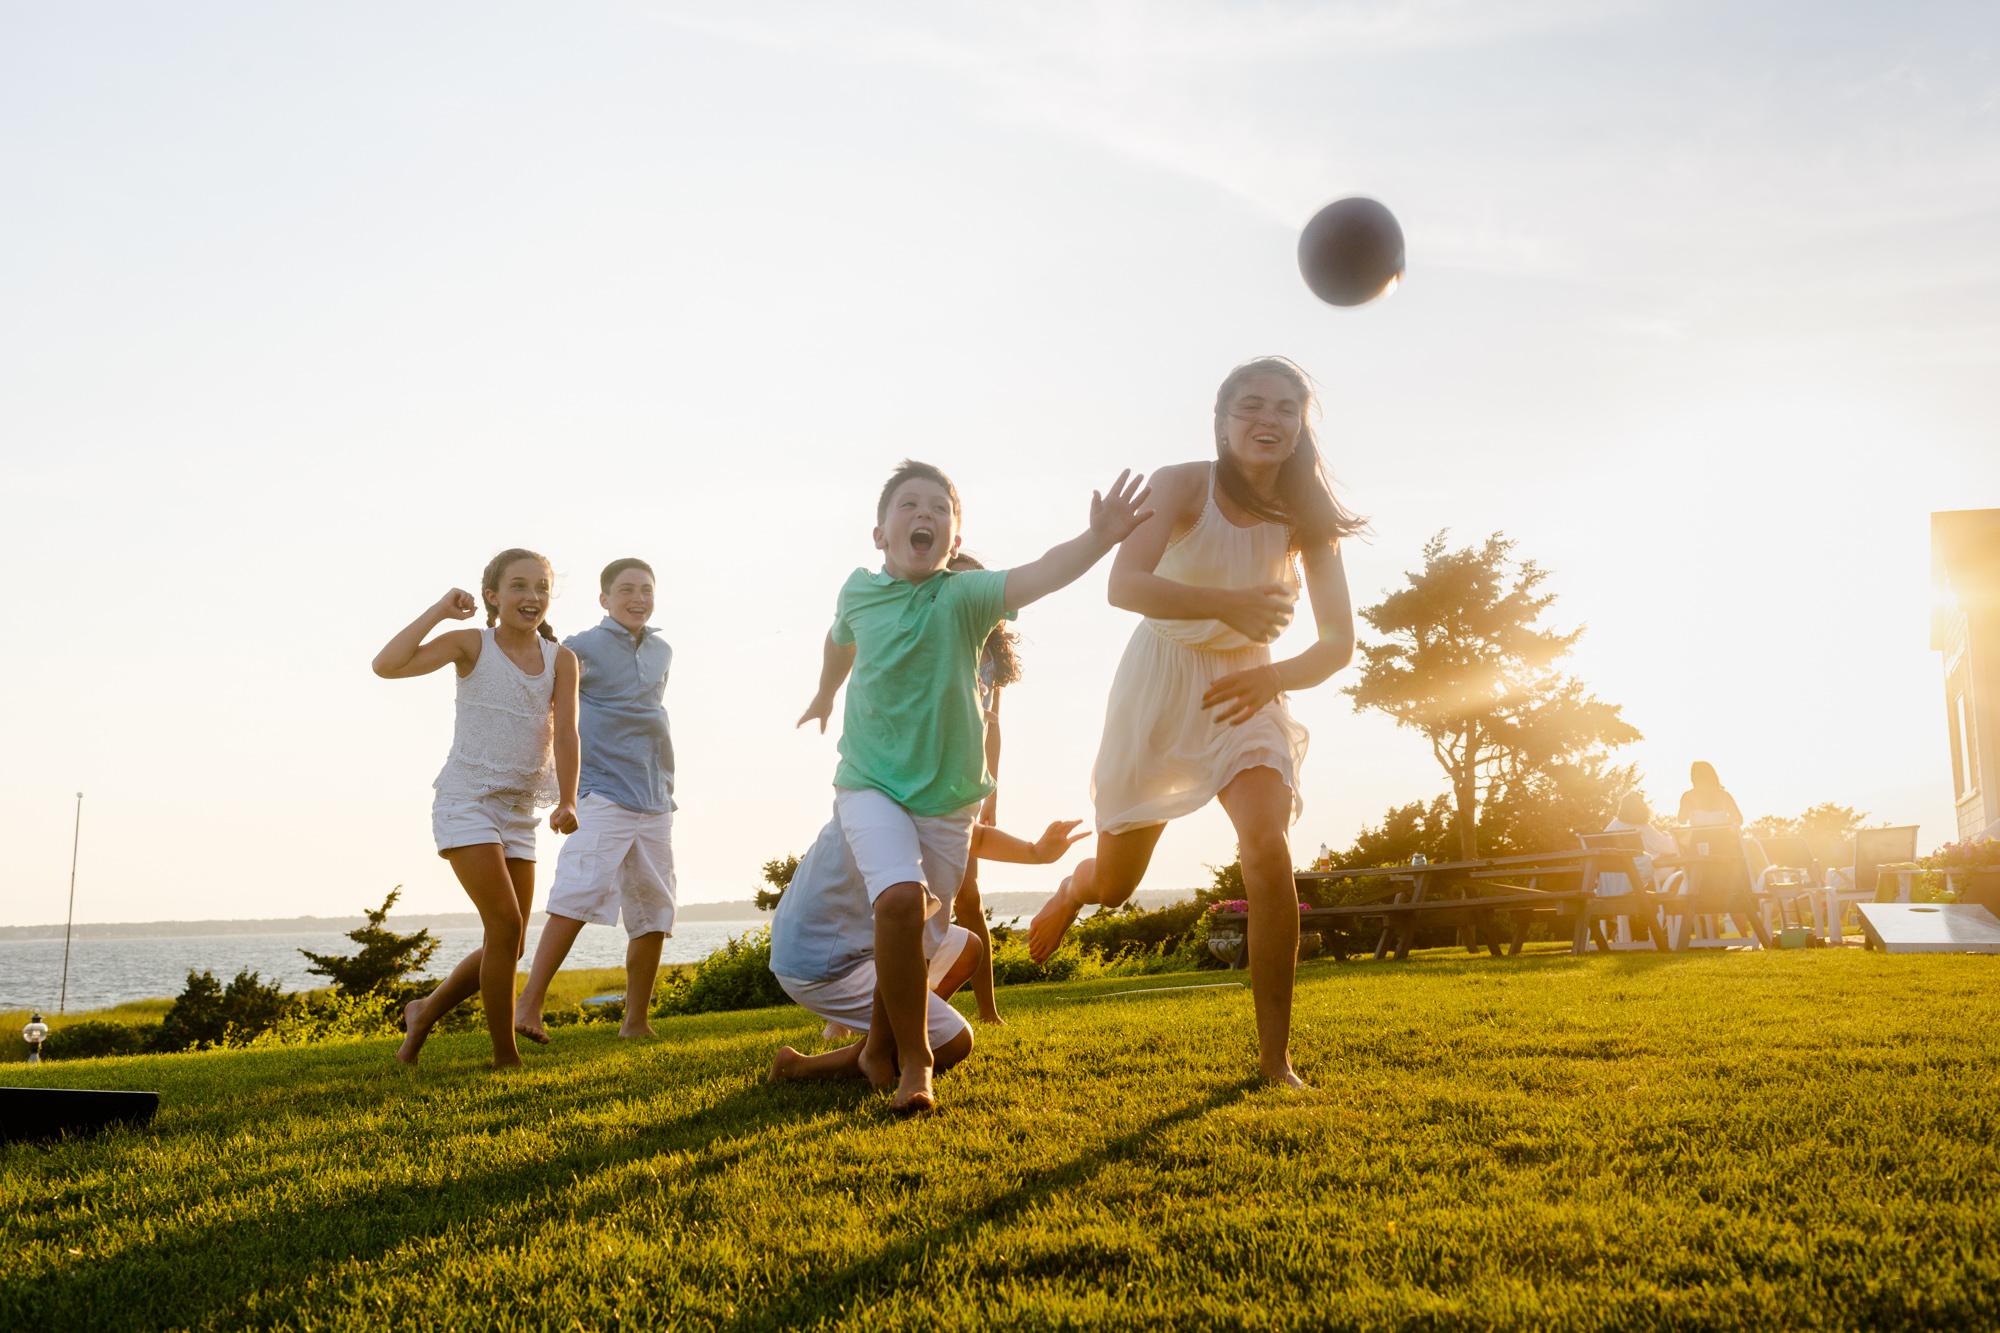 kids reaching for football